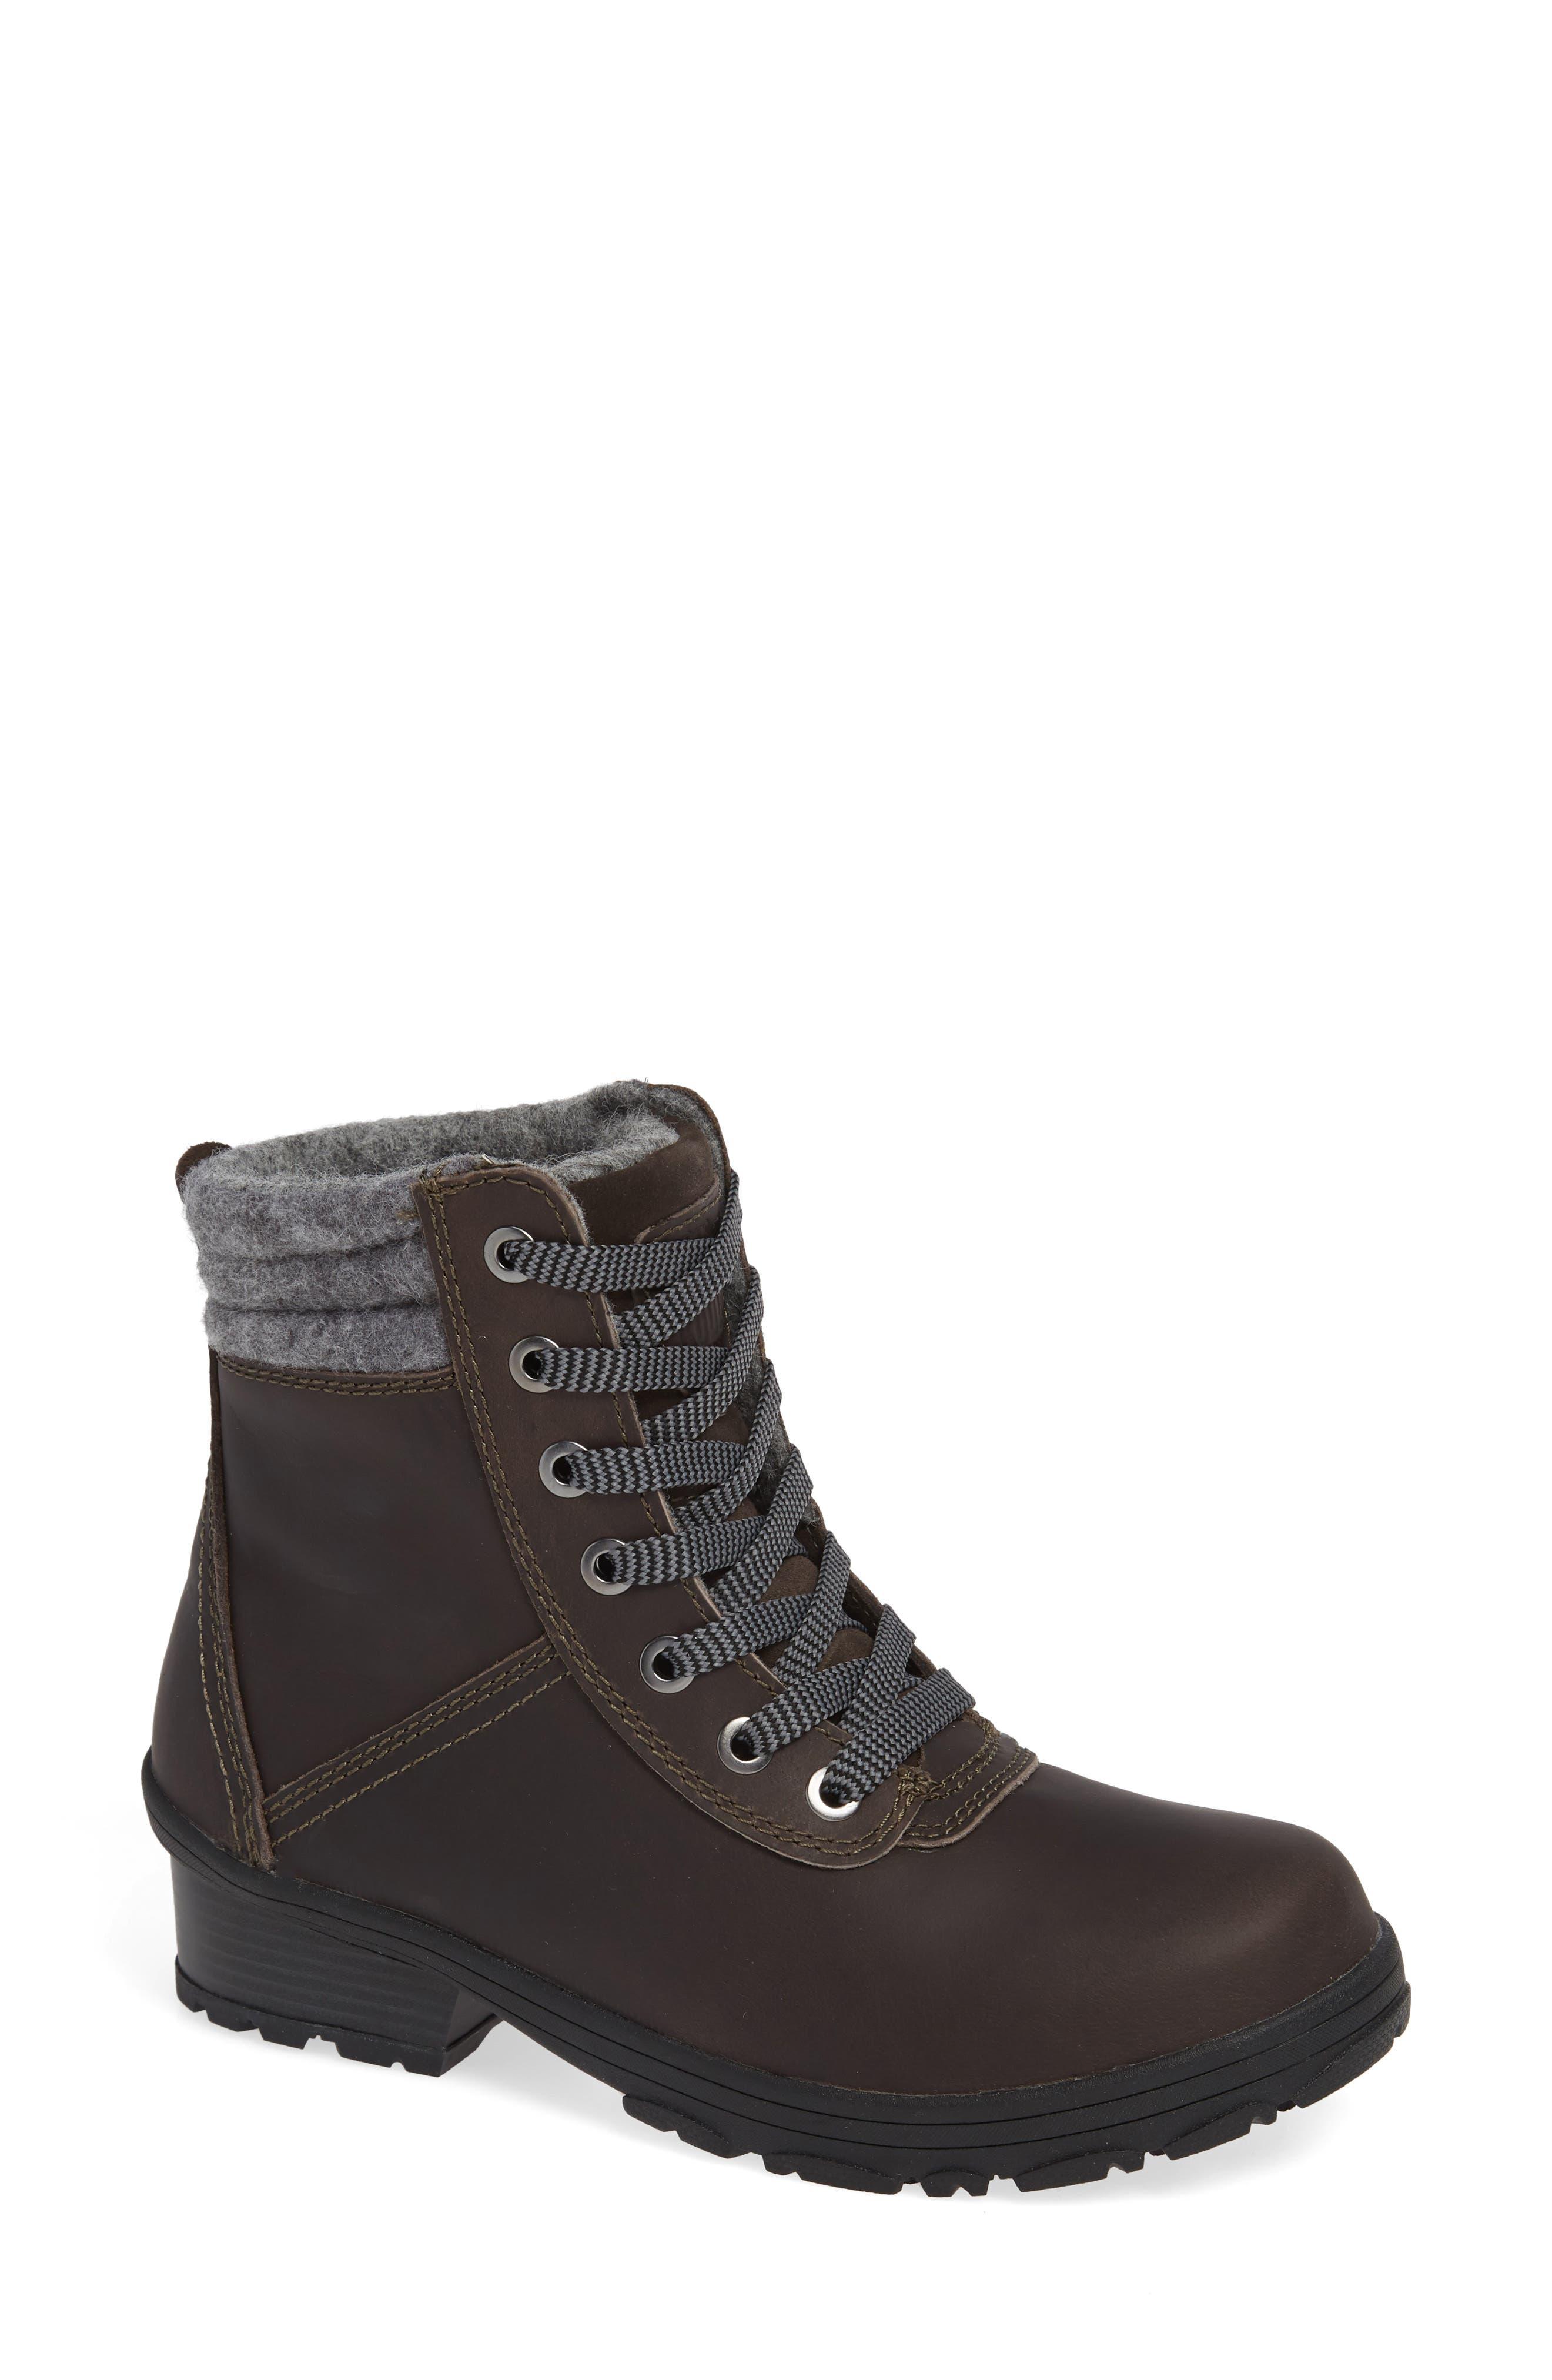 Kodiak Shari Waterproof Hiking Boot, Brown